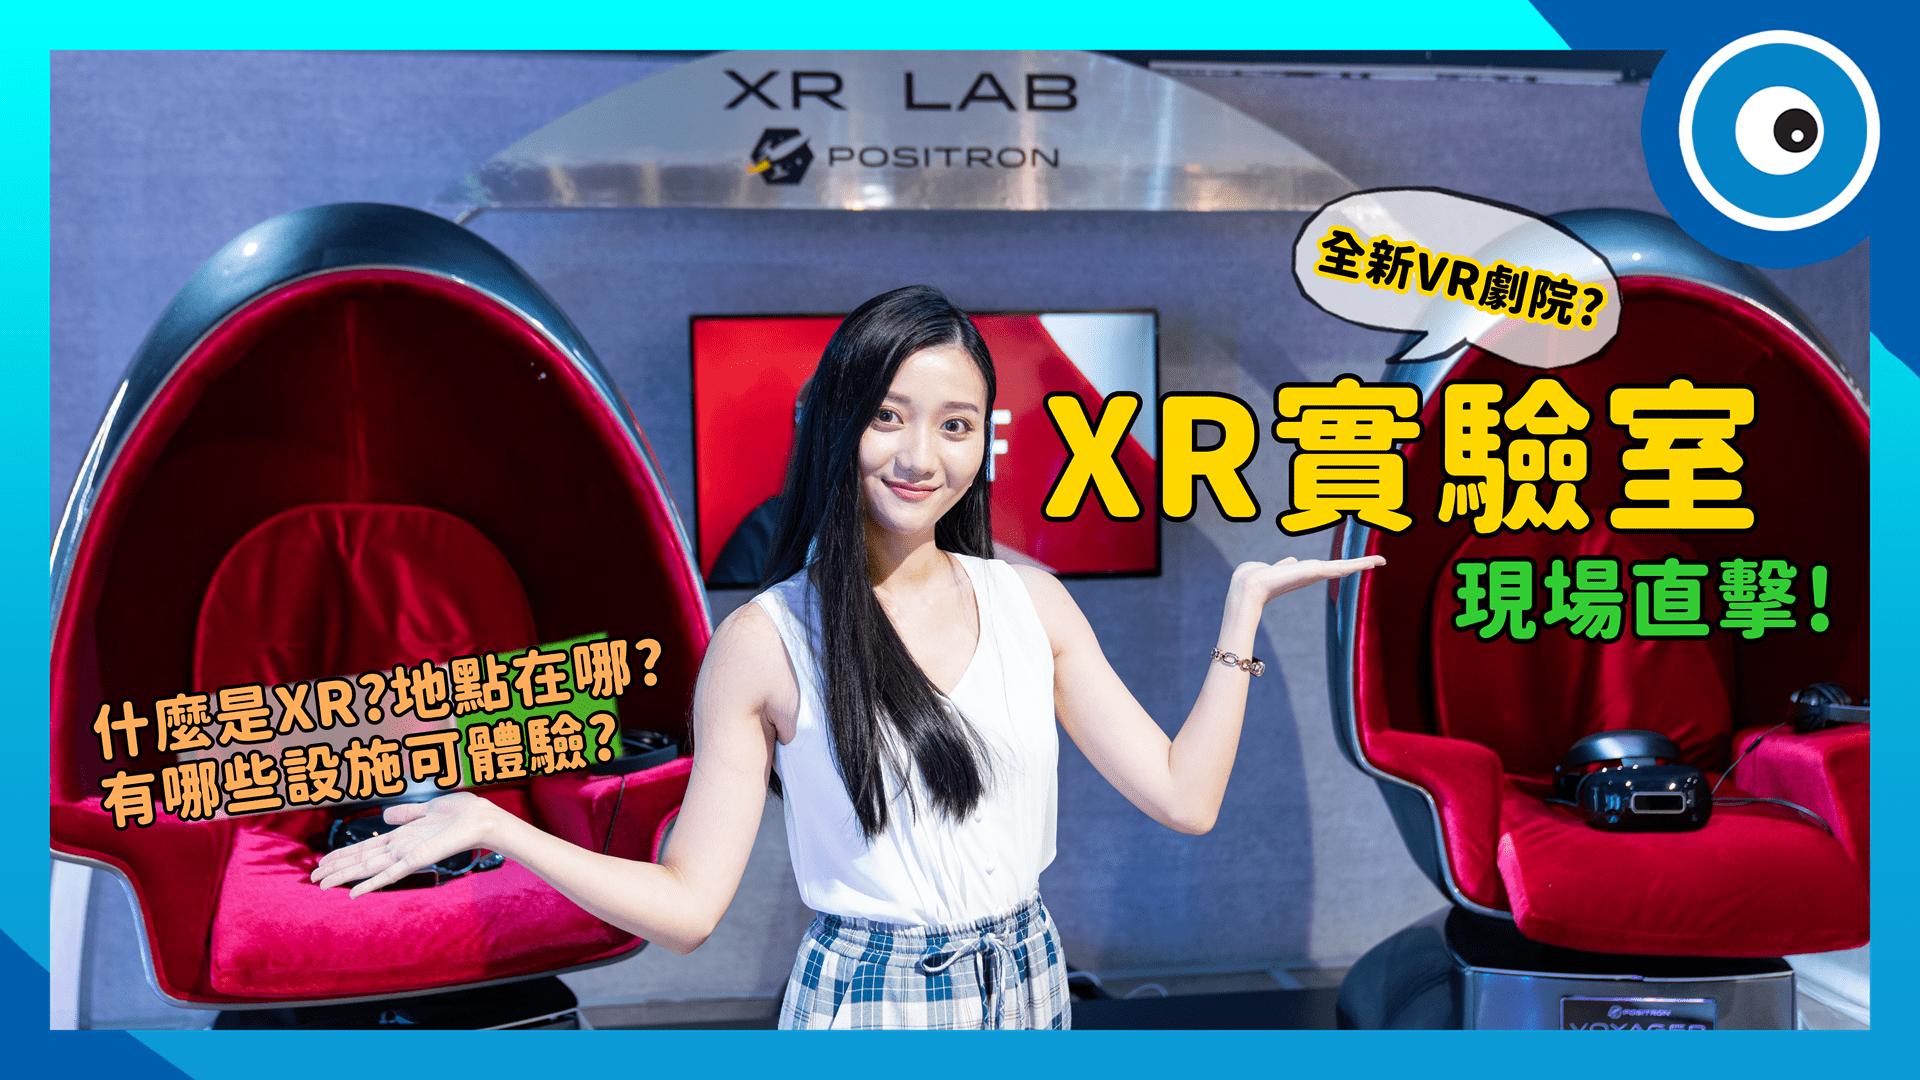 XR 實驗室作為台灣第一家以 VR 結合沈浸式蛋型體感椅的戲院,究竟大家可以在這裡體驗到那些科技新事物呢?一起看影片了解囉!